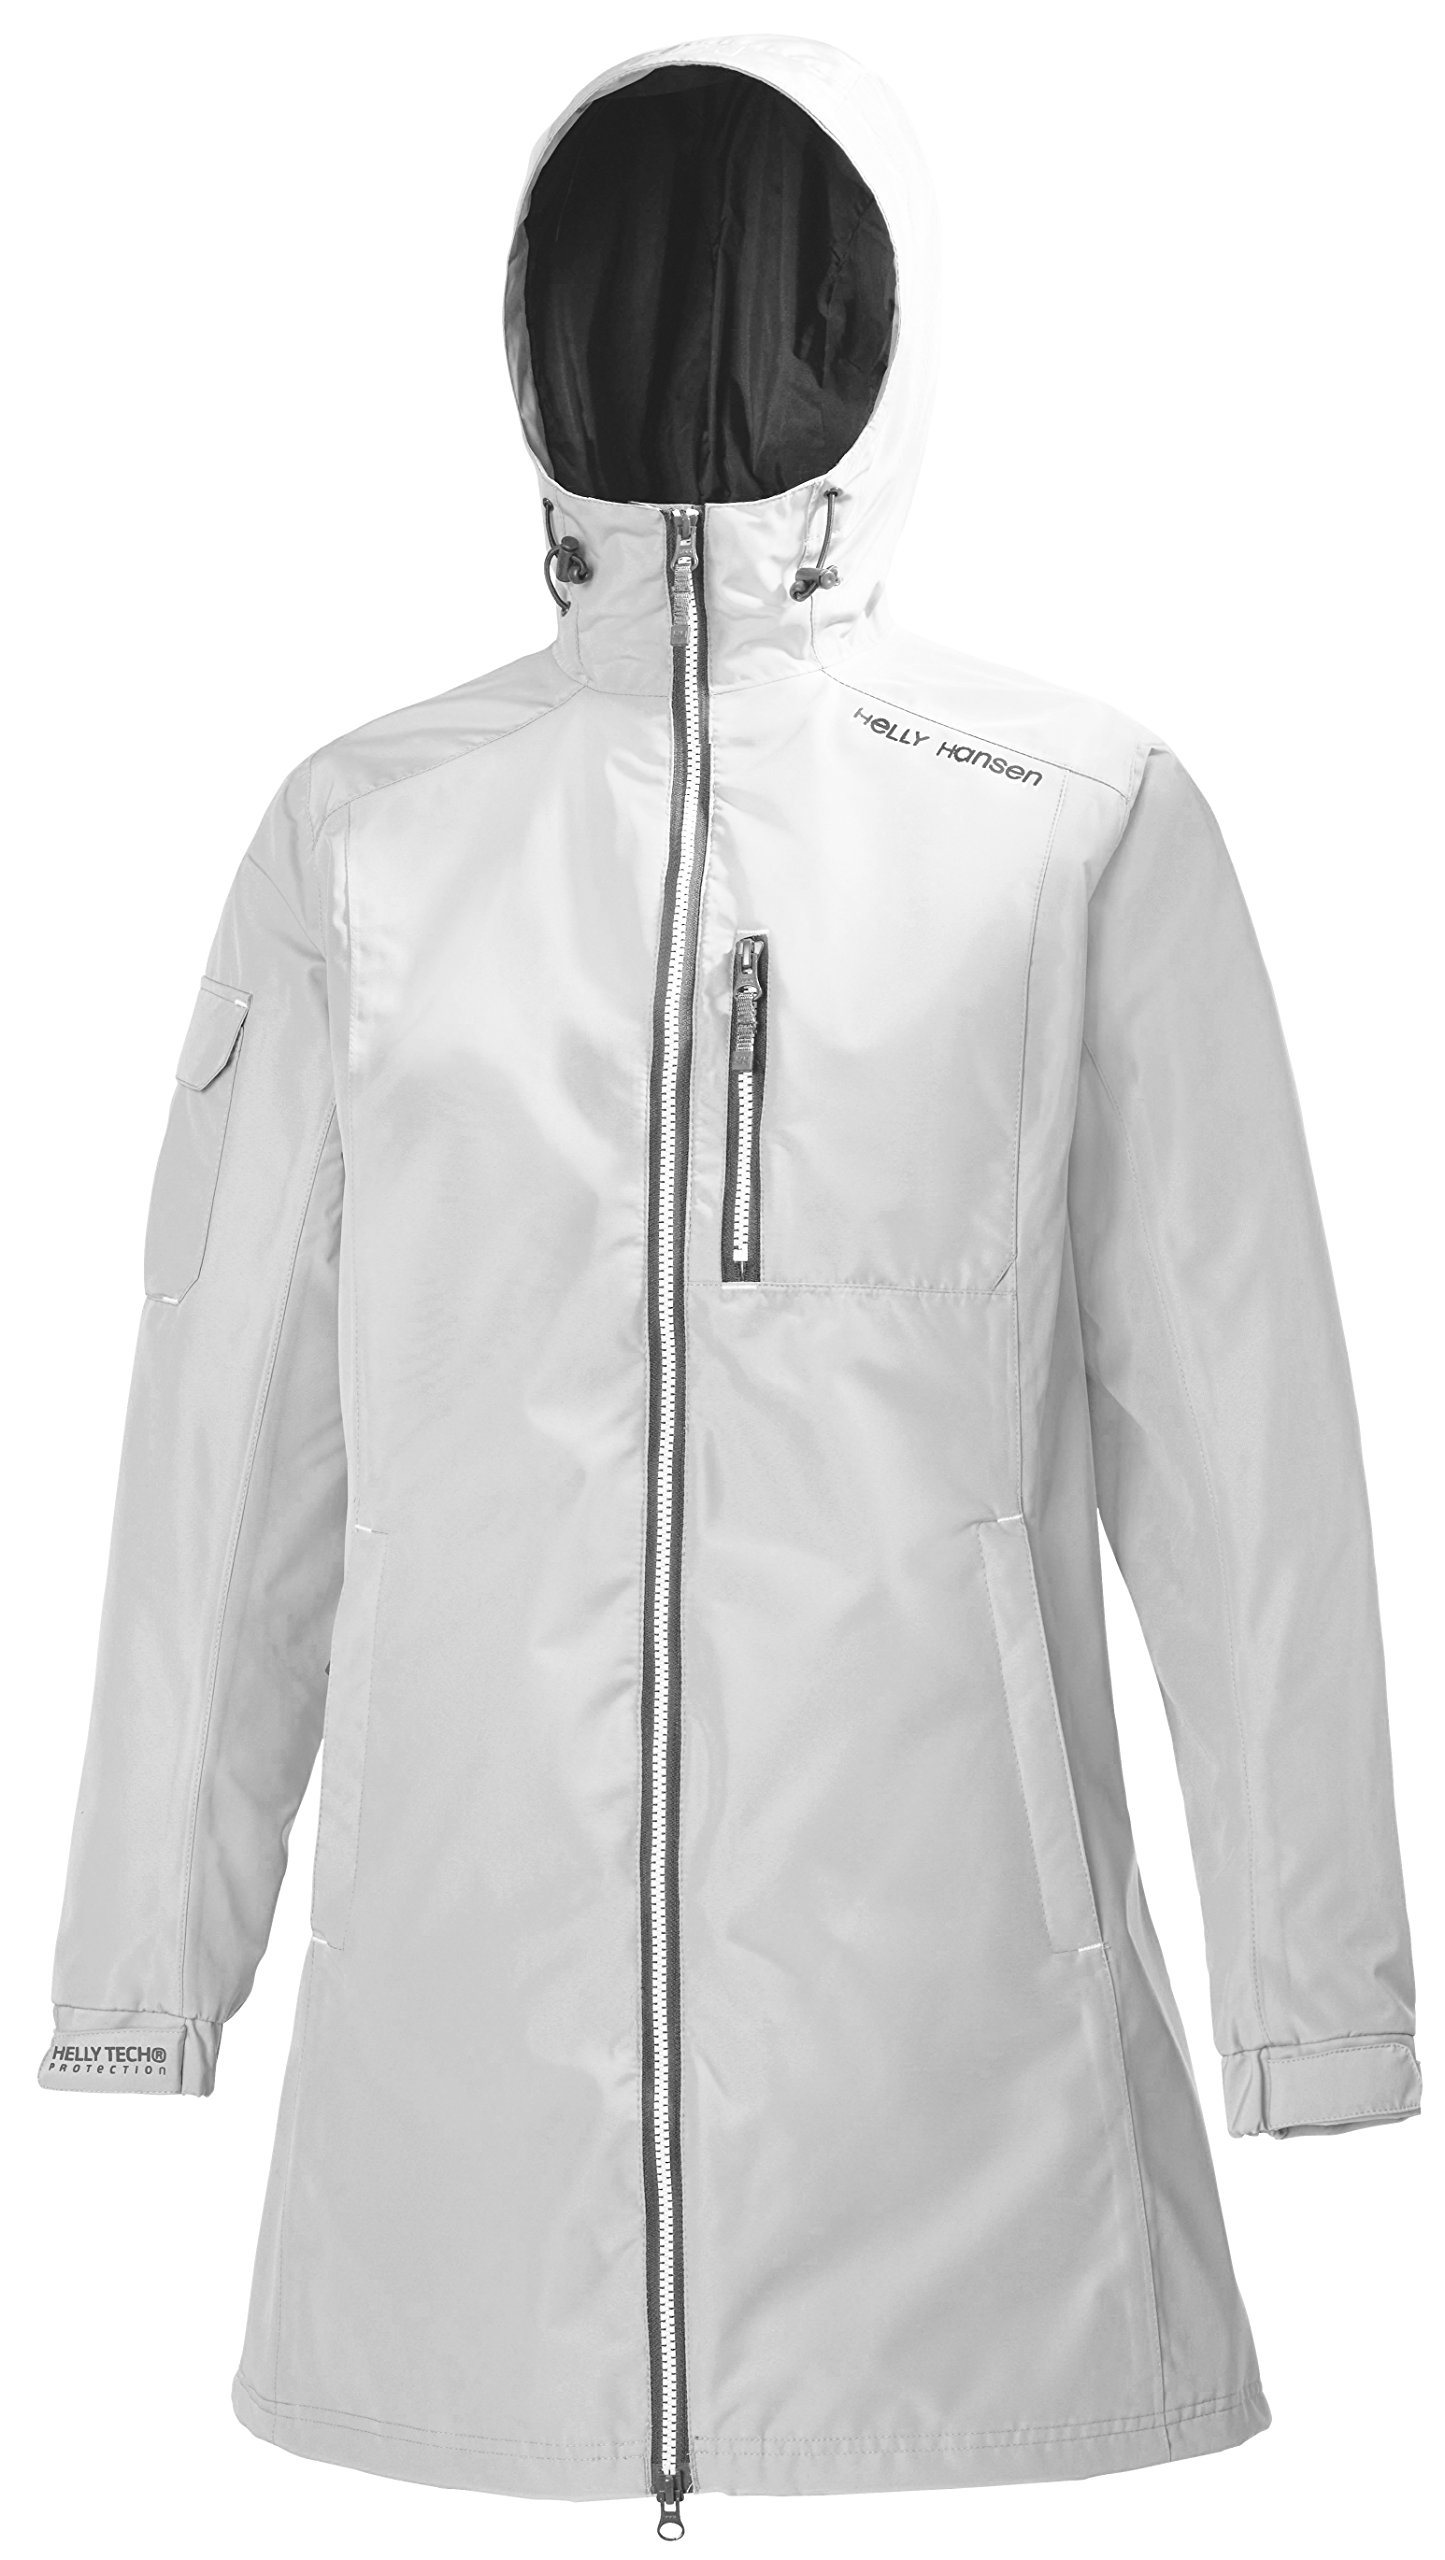 Helly Hansen Women's Long Belfast Lightweight Waterproof Windproof Breathable Raincoat Jacket with Hood, 001 White, X-Large by Helly Hansen